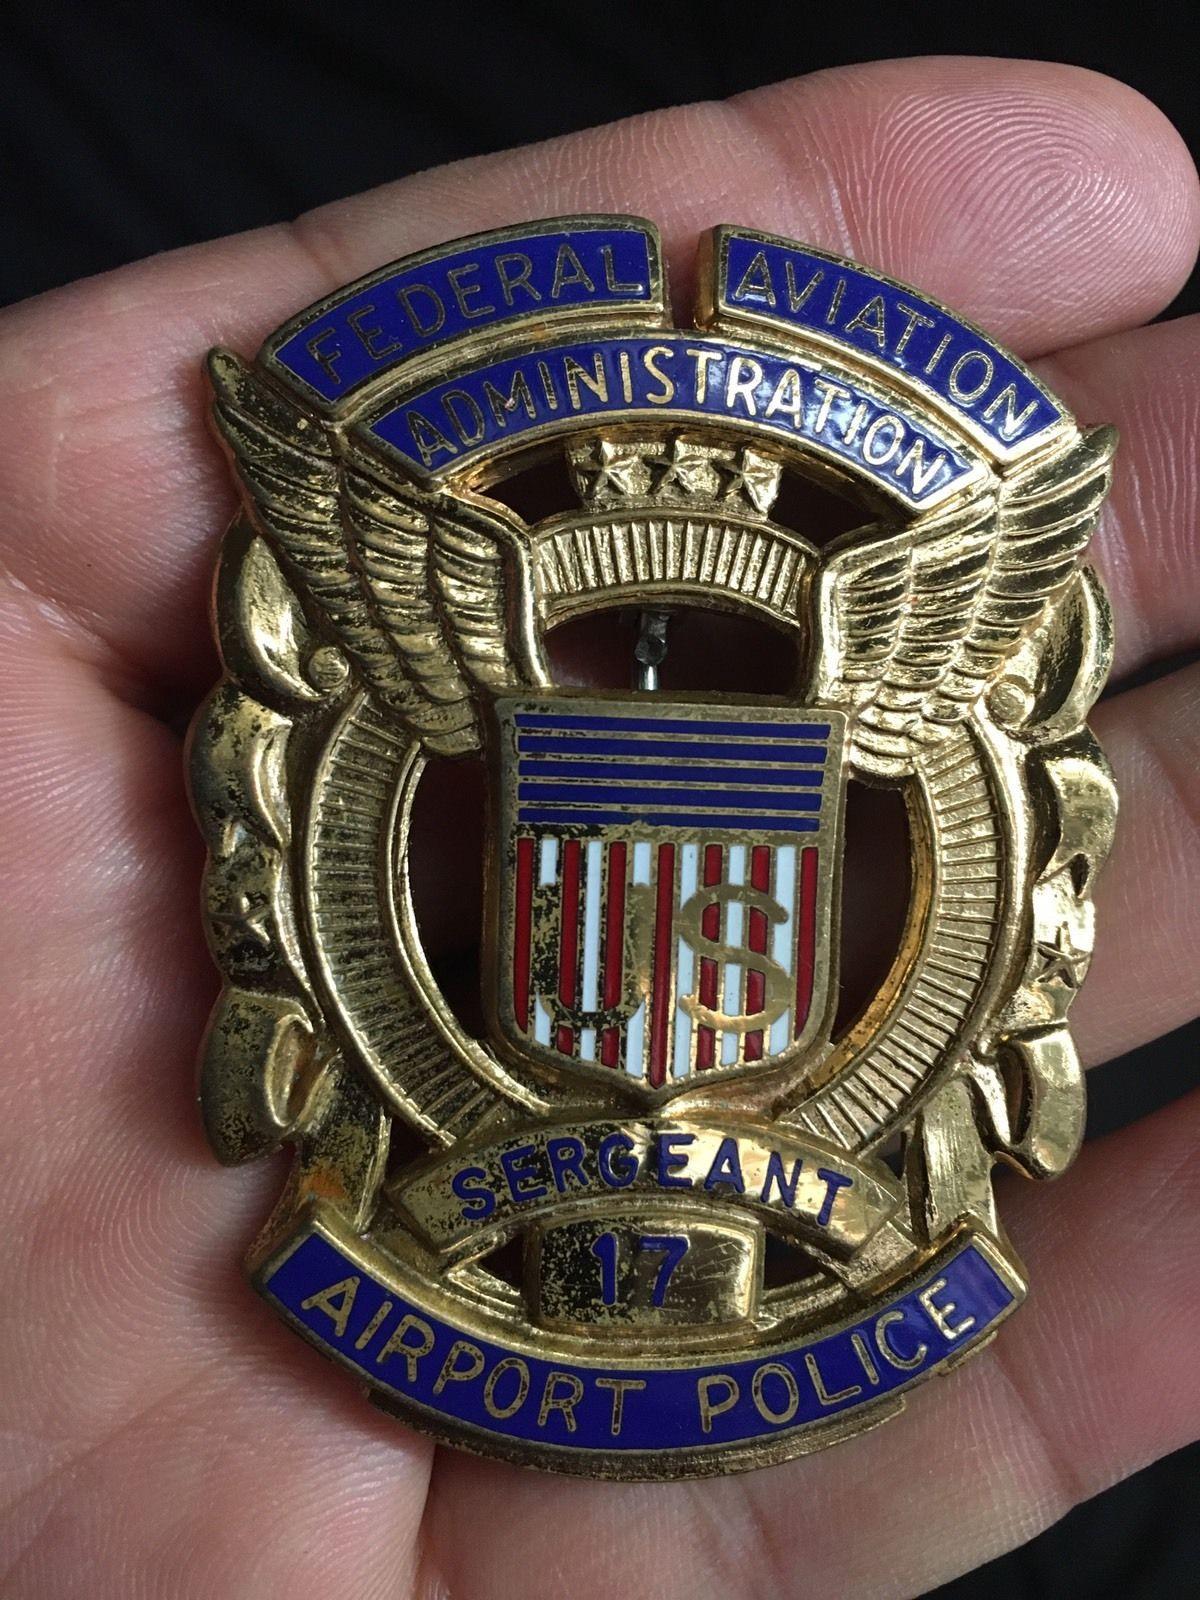 Police cap badges ga rel hat badges page 1 garel - Federal Aviation Administration Airport Police Sergeant